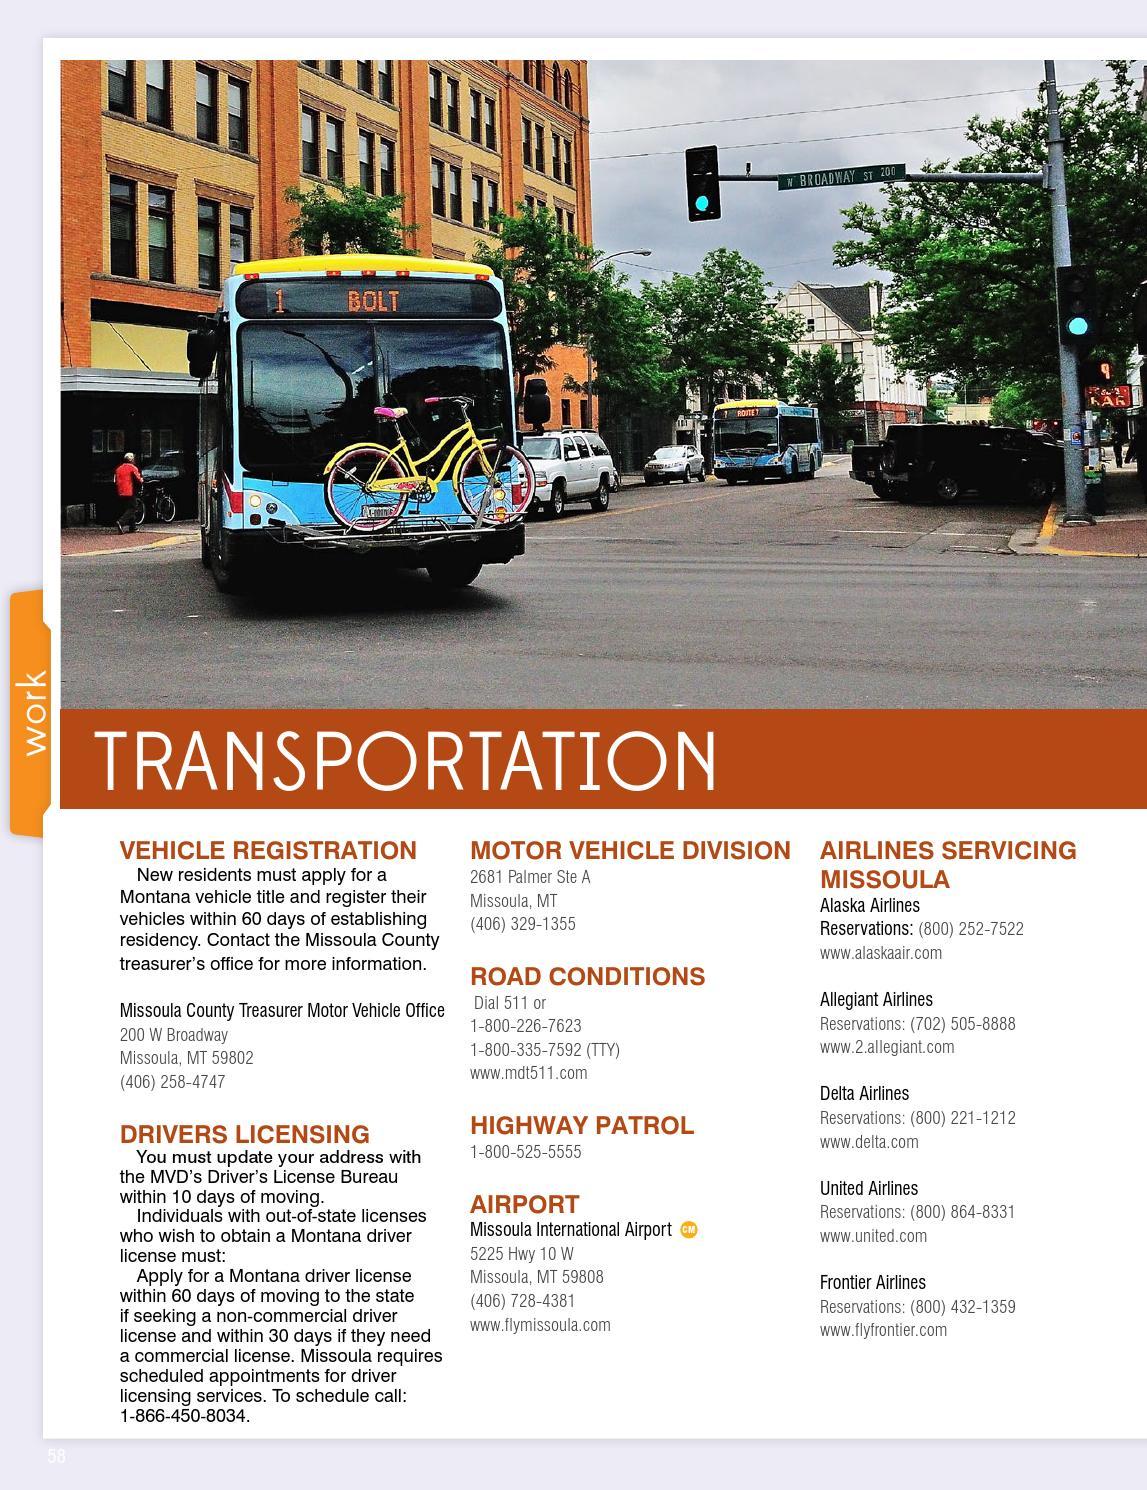 Missoula Relocation Guide - 2014 by Missoulian - issuu